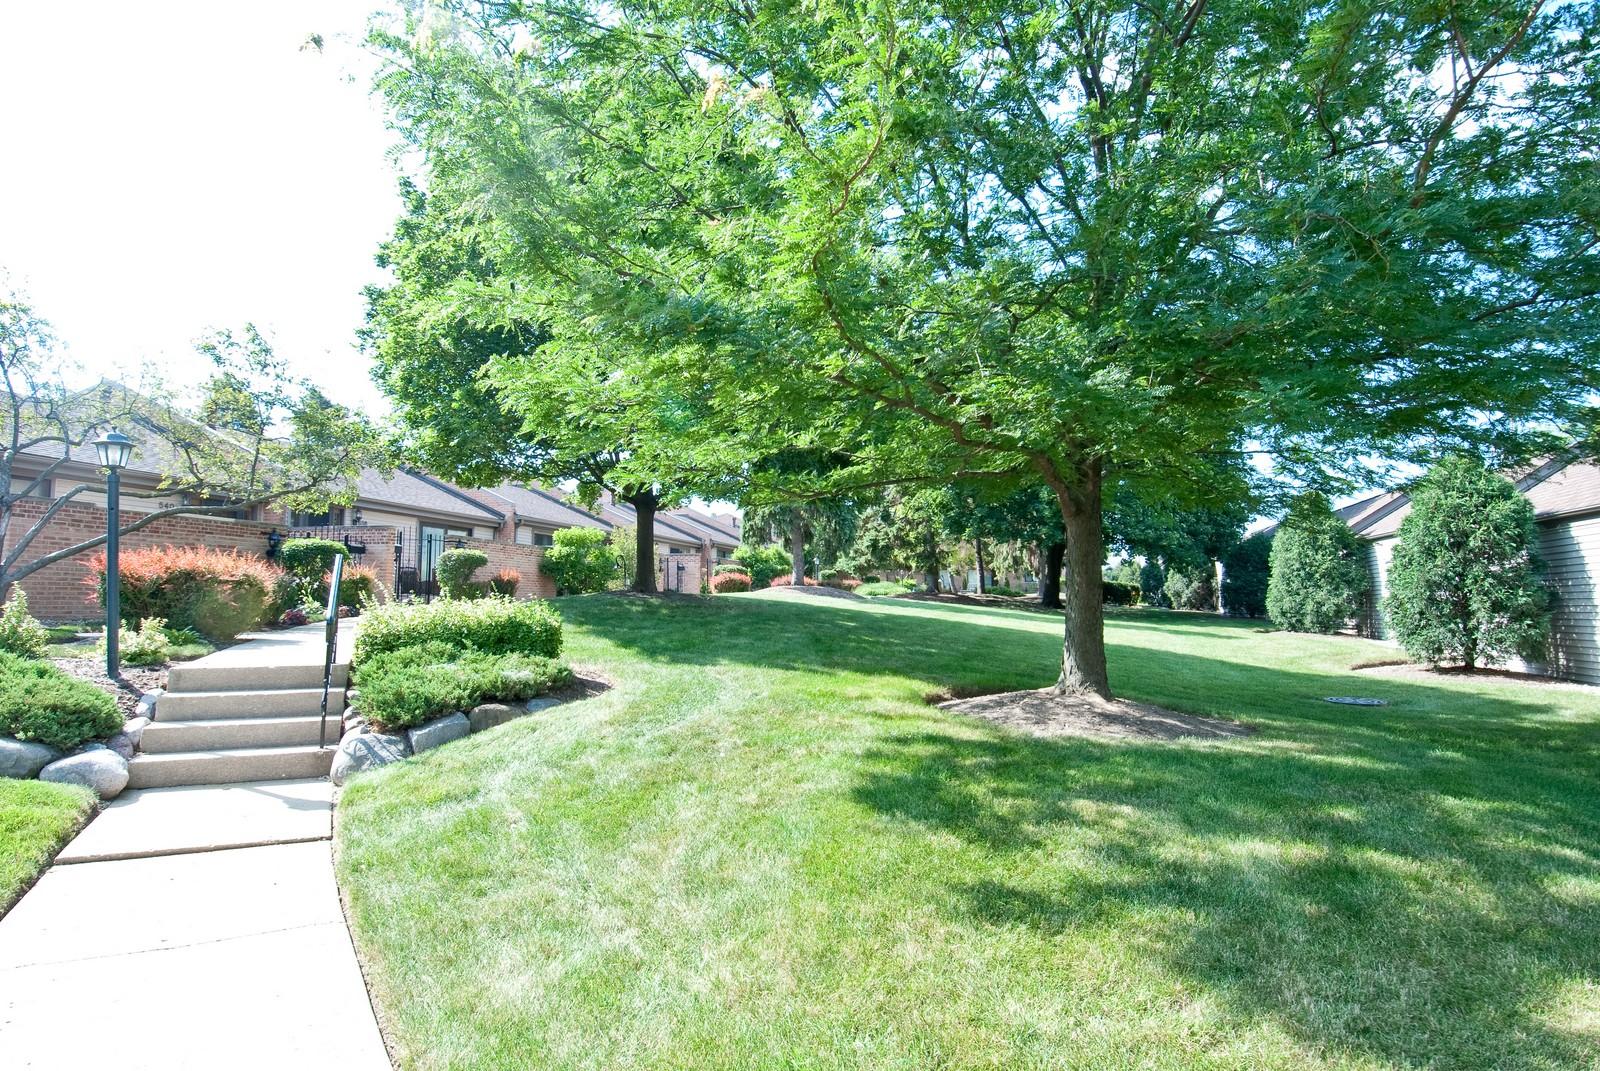 Real Estate Photography - 550 E Main St, Unit 2C, Barrington, IL, 60010 - Courtyard